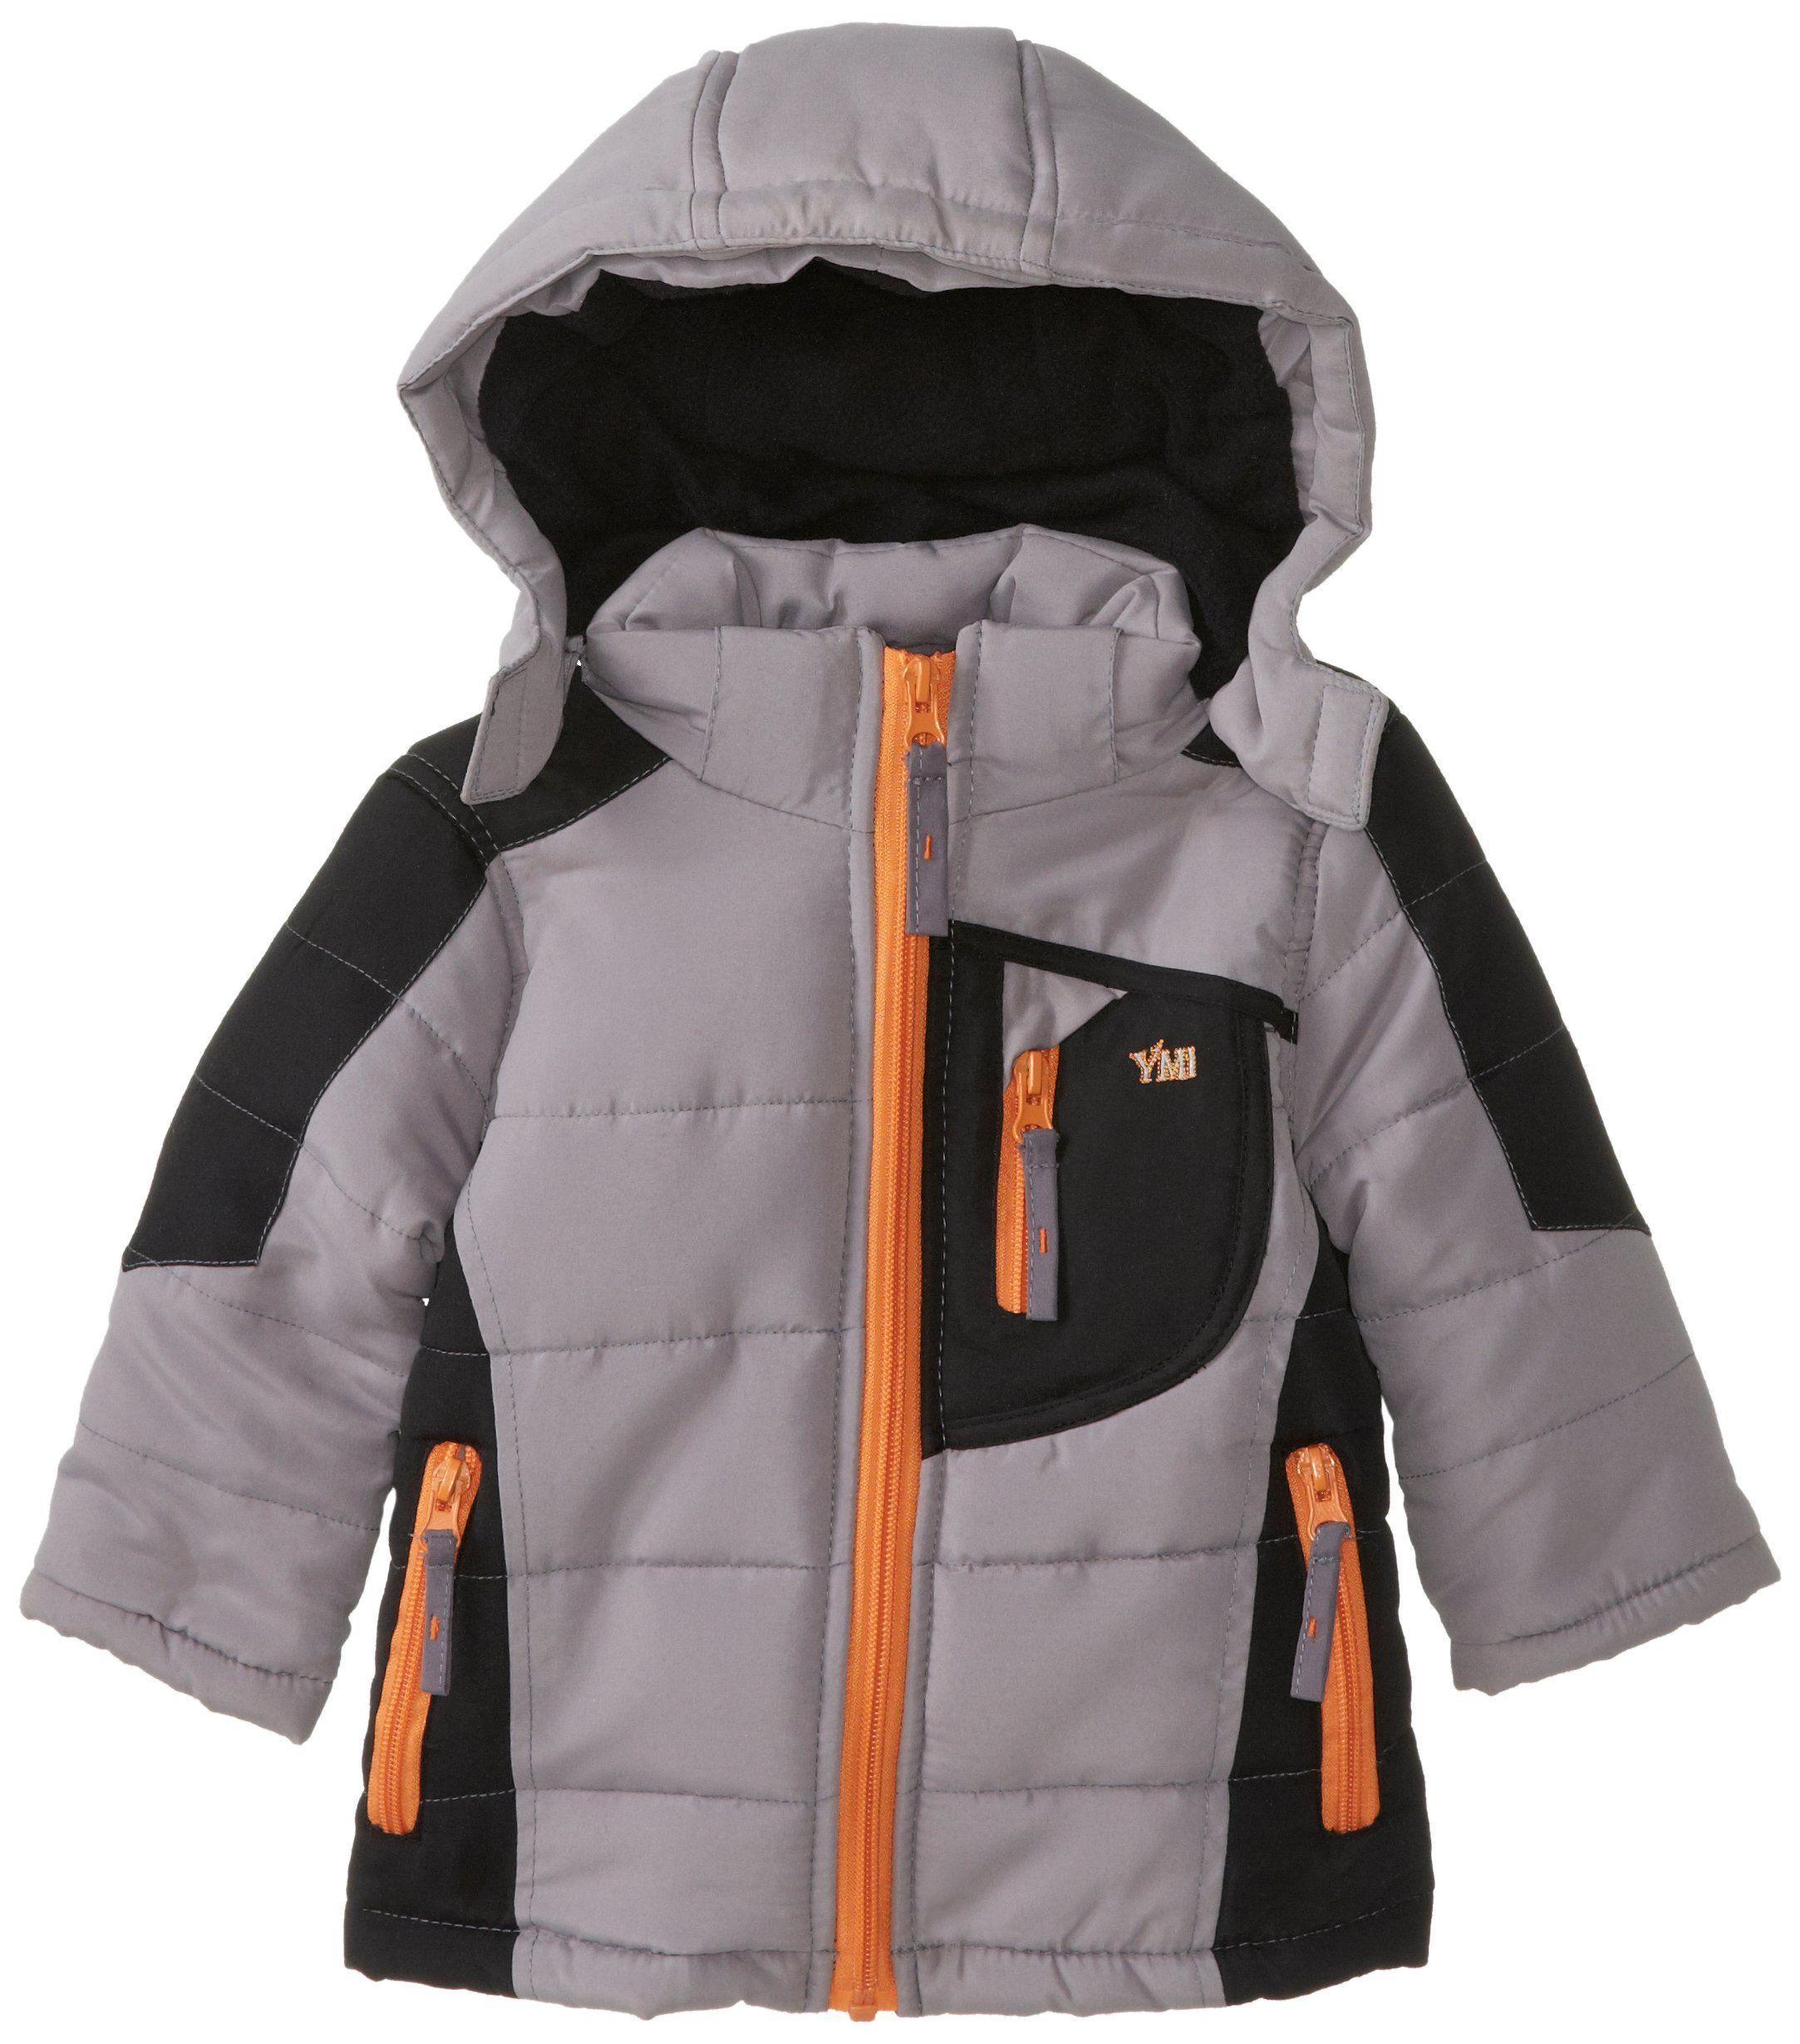 Amazon YMI Baby Boys Infant Hooded Color Block Bubble Jacket